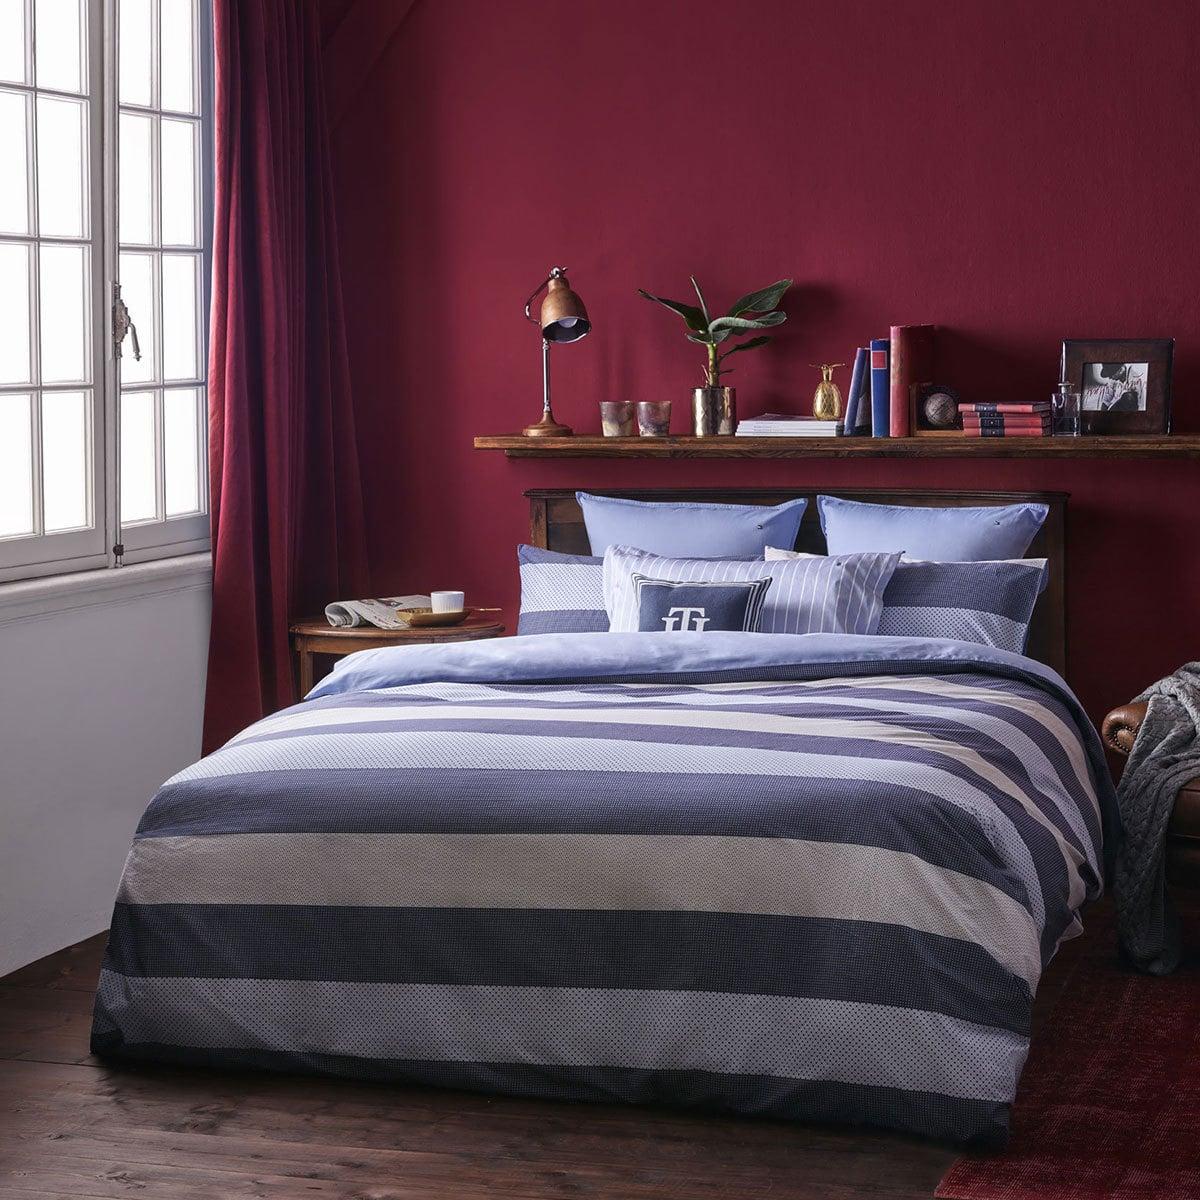 gnstig latest perfect awesome full size of badmobel landhaus gunstig und badmbel landhaus. Black Bedroom Furniture Sets. Home Design Ideas